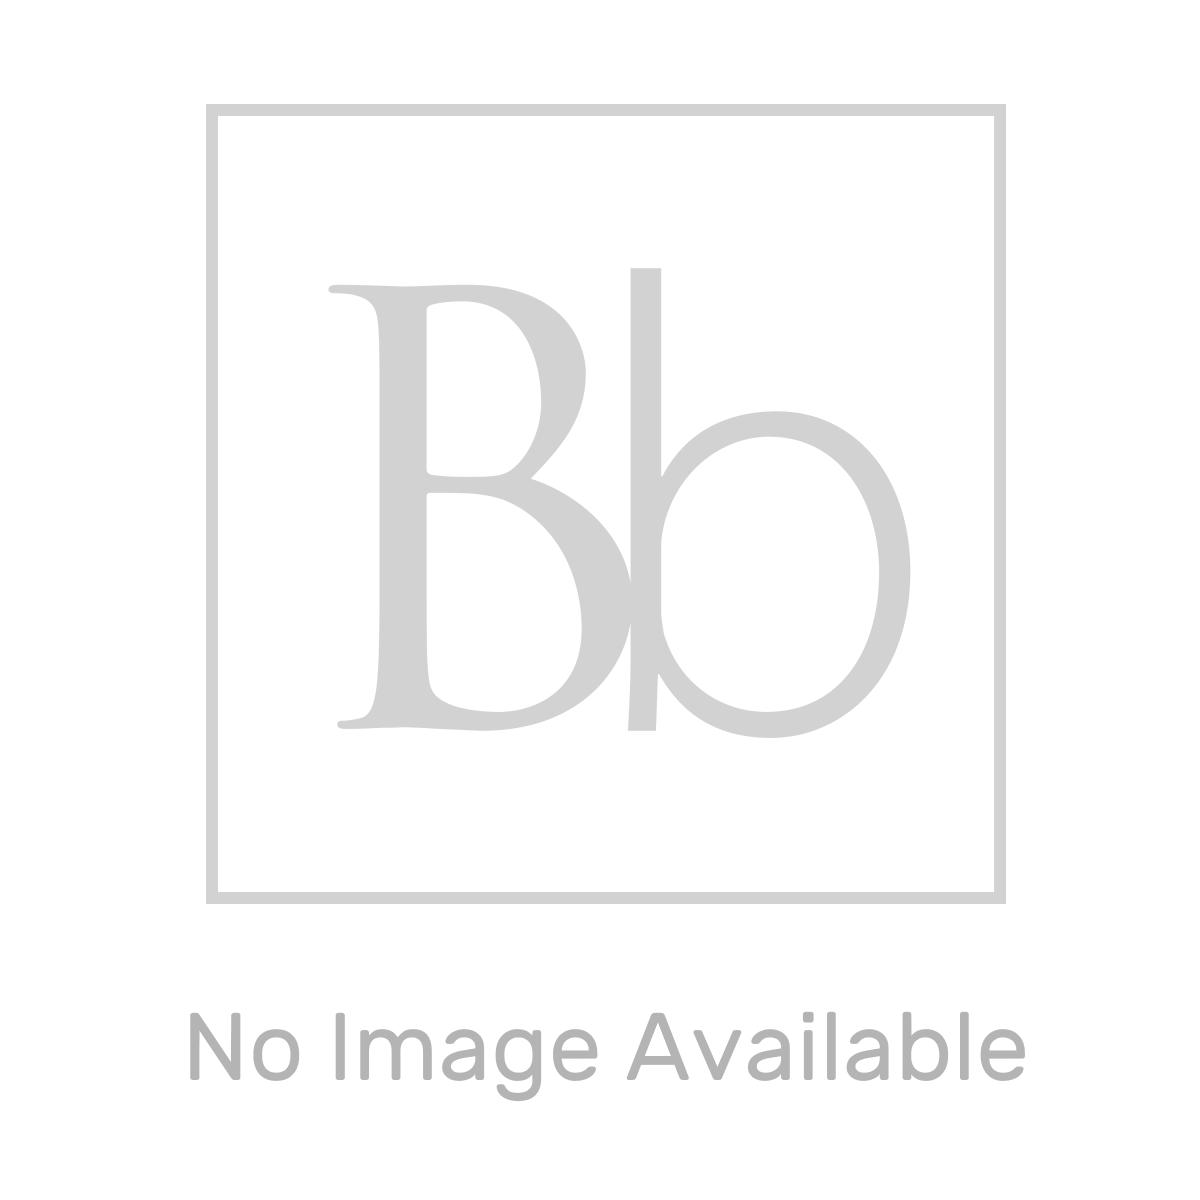 Aquadart Rectangular 1100 x 760 Shower Tray